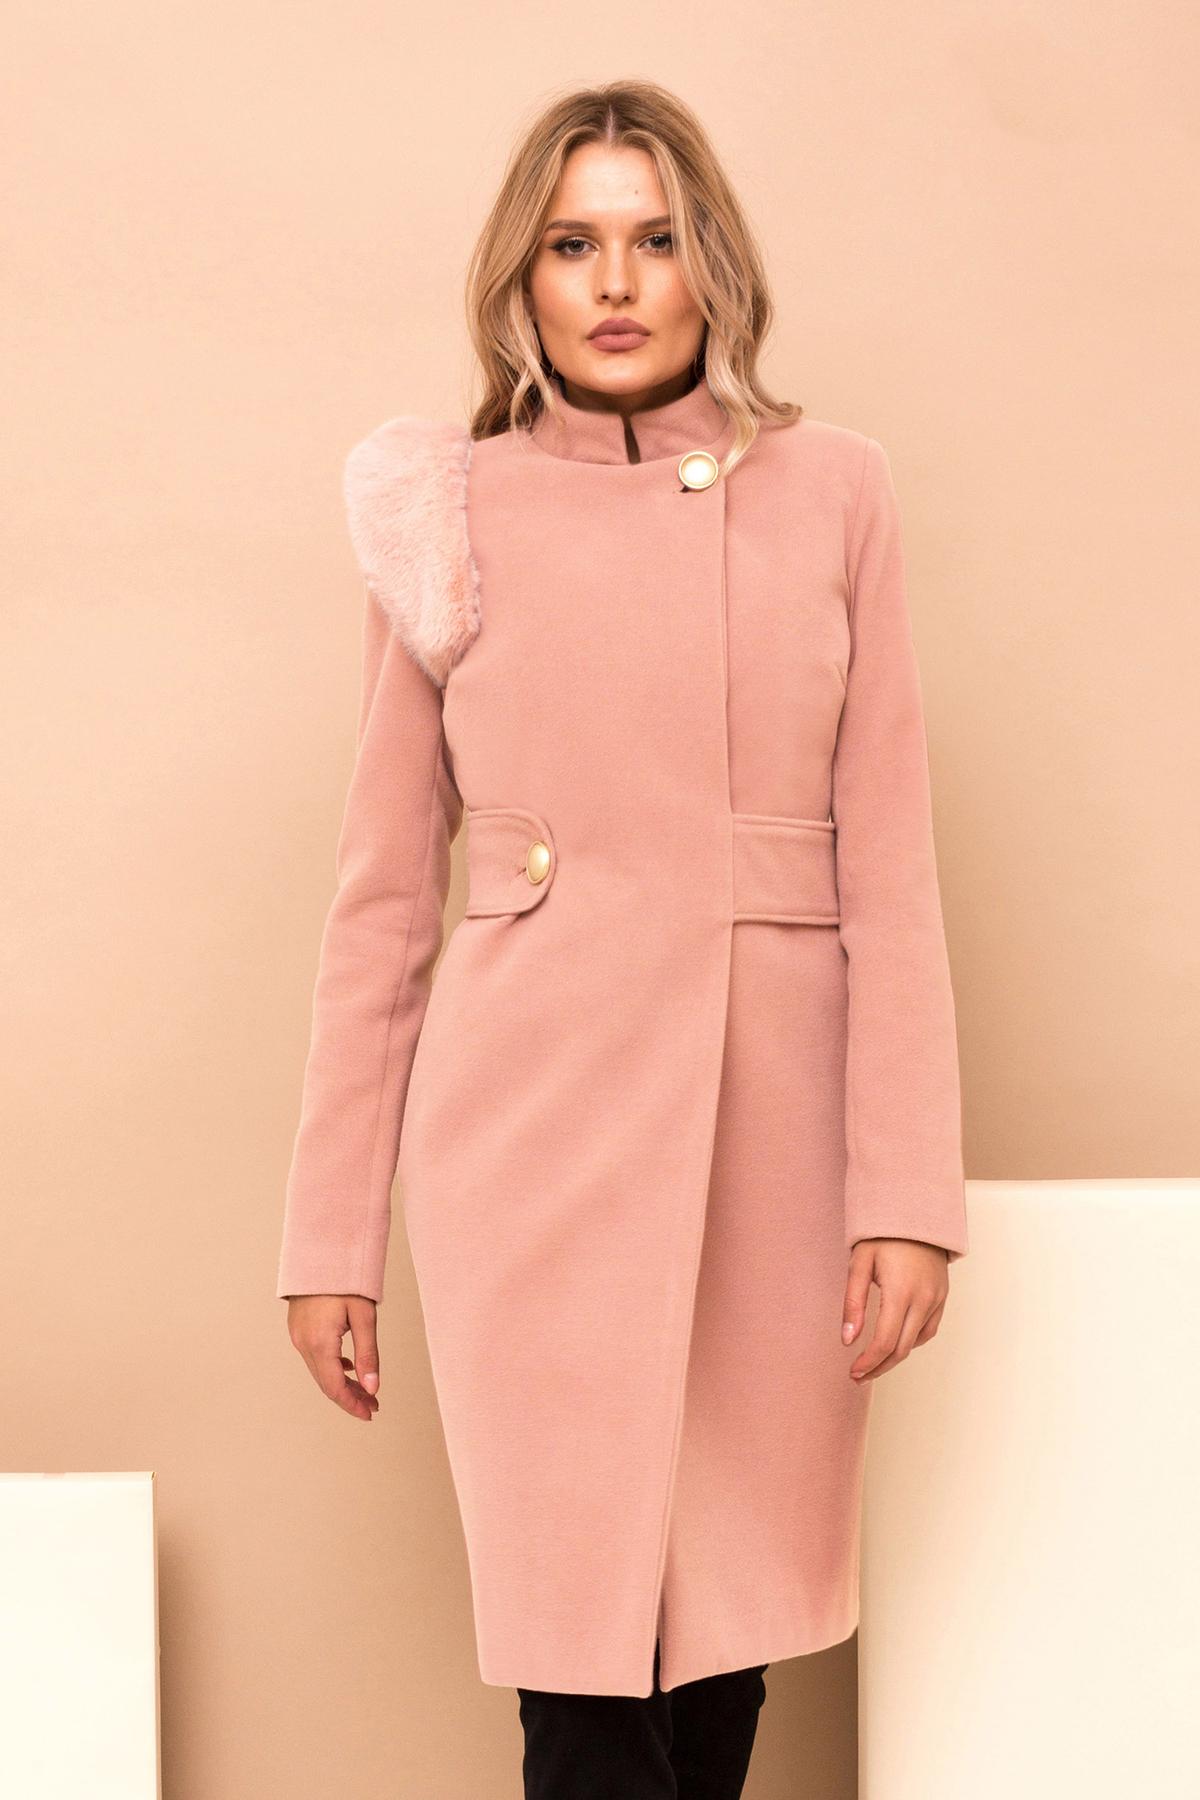 Palton PrettyGirl roz prafuit din stofa cu insertii cu blana ecologica accesorizat cu cordon